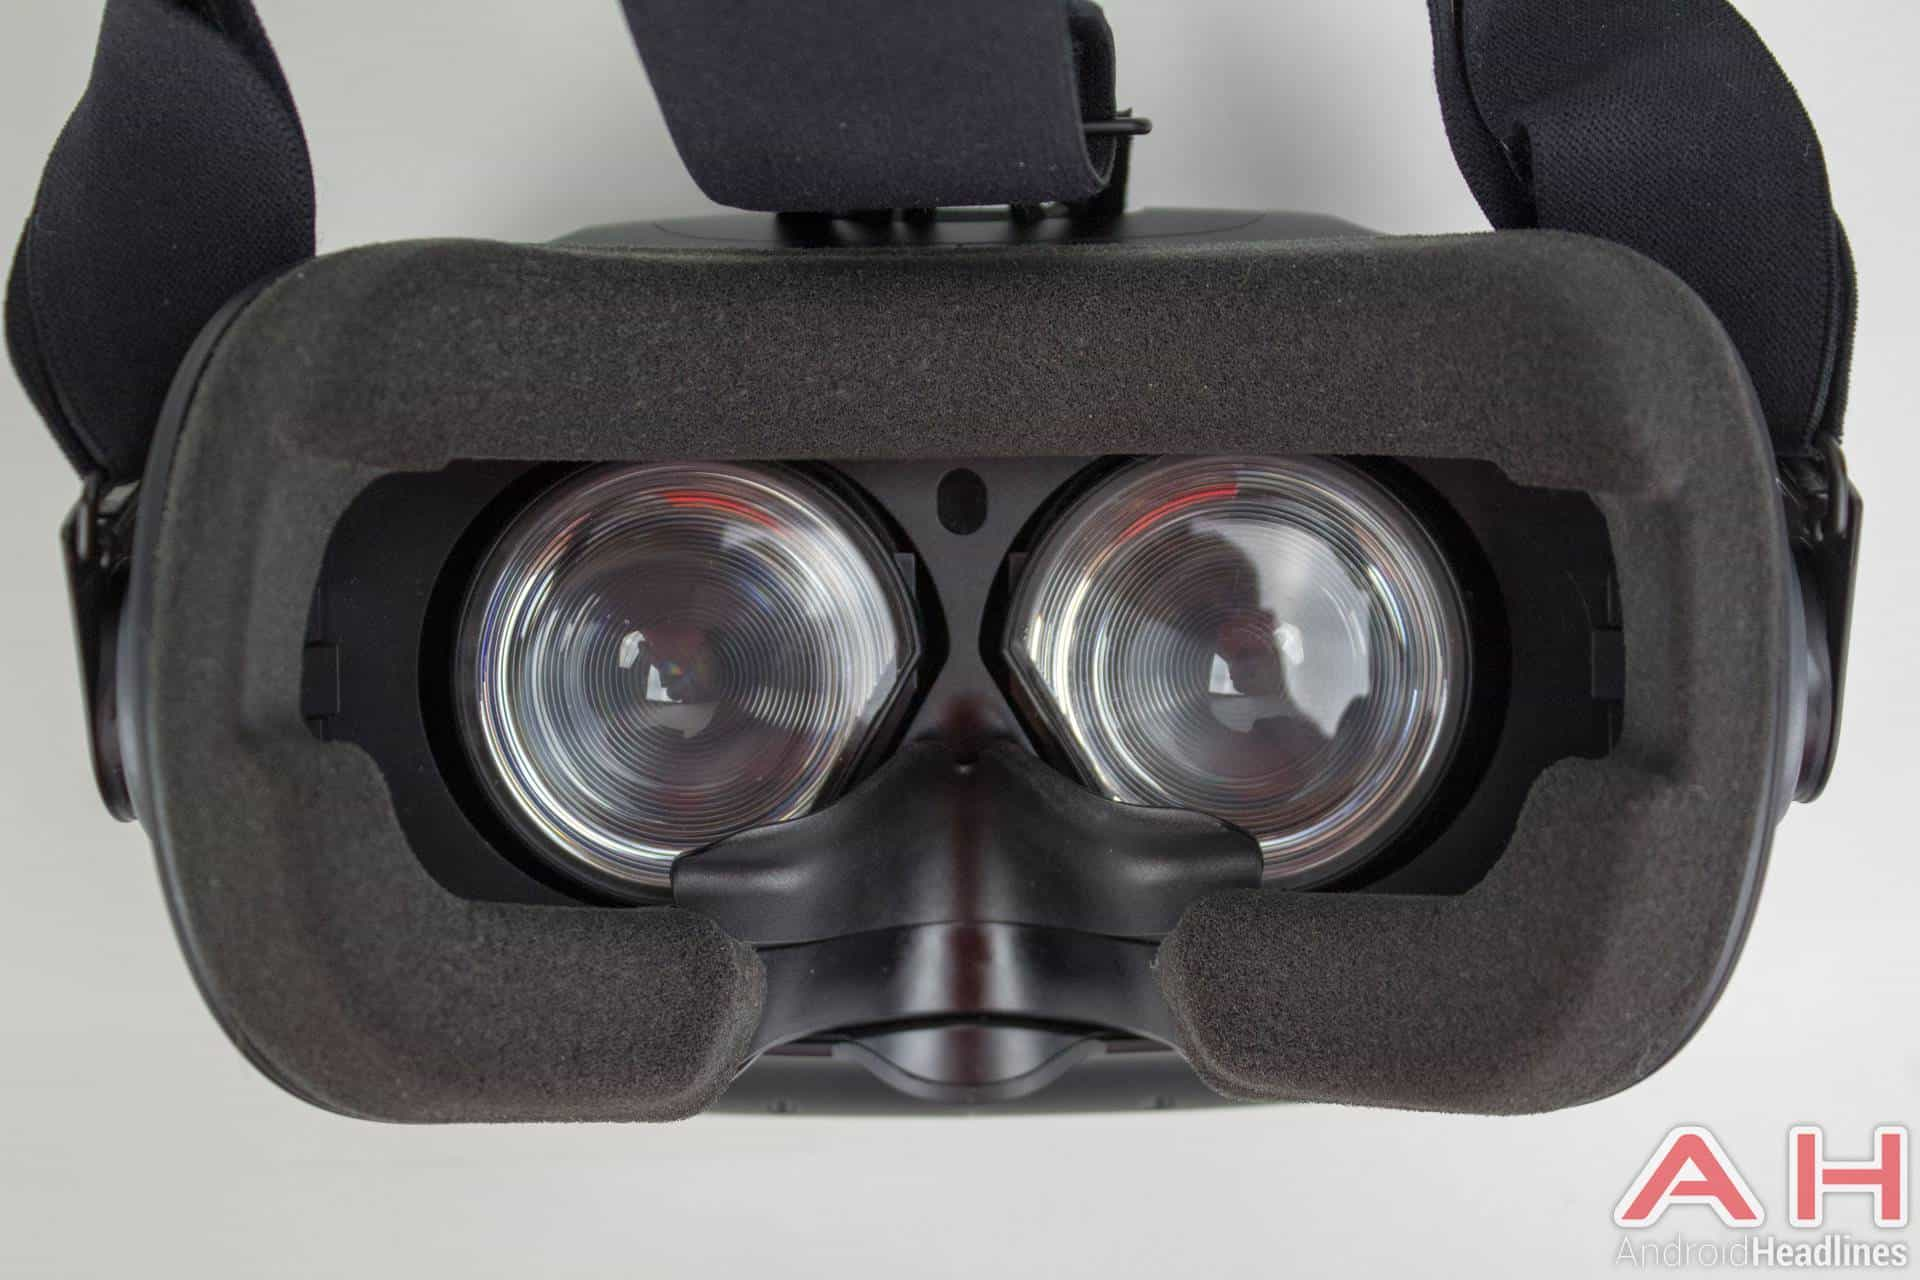 HTC Vive AH NS lenses 1